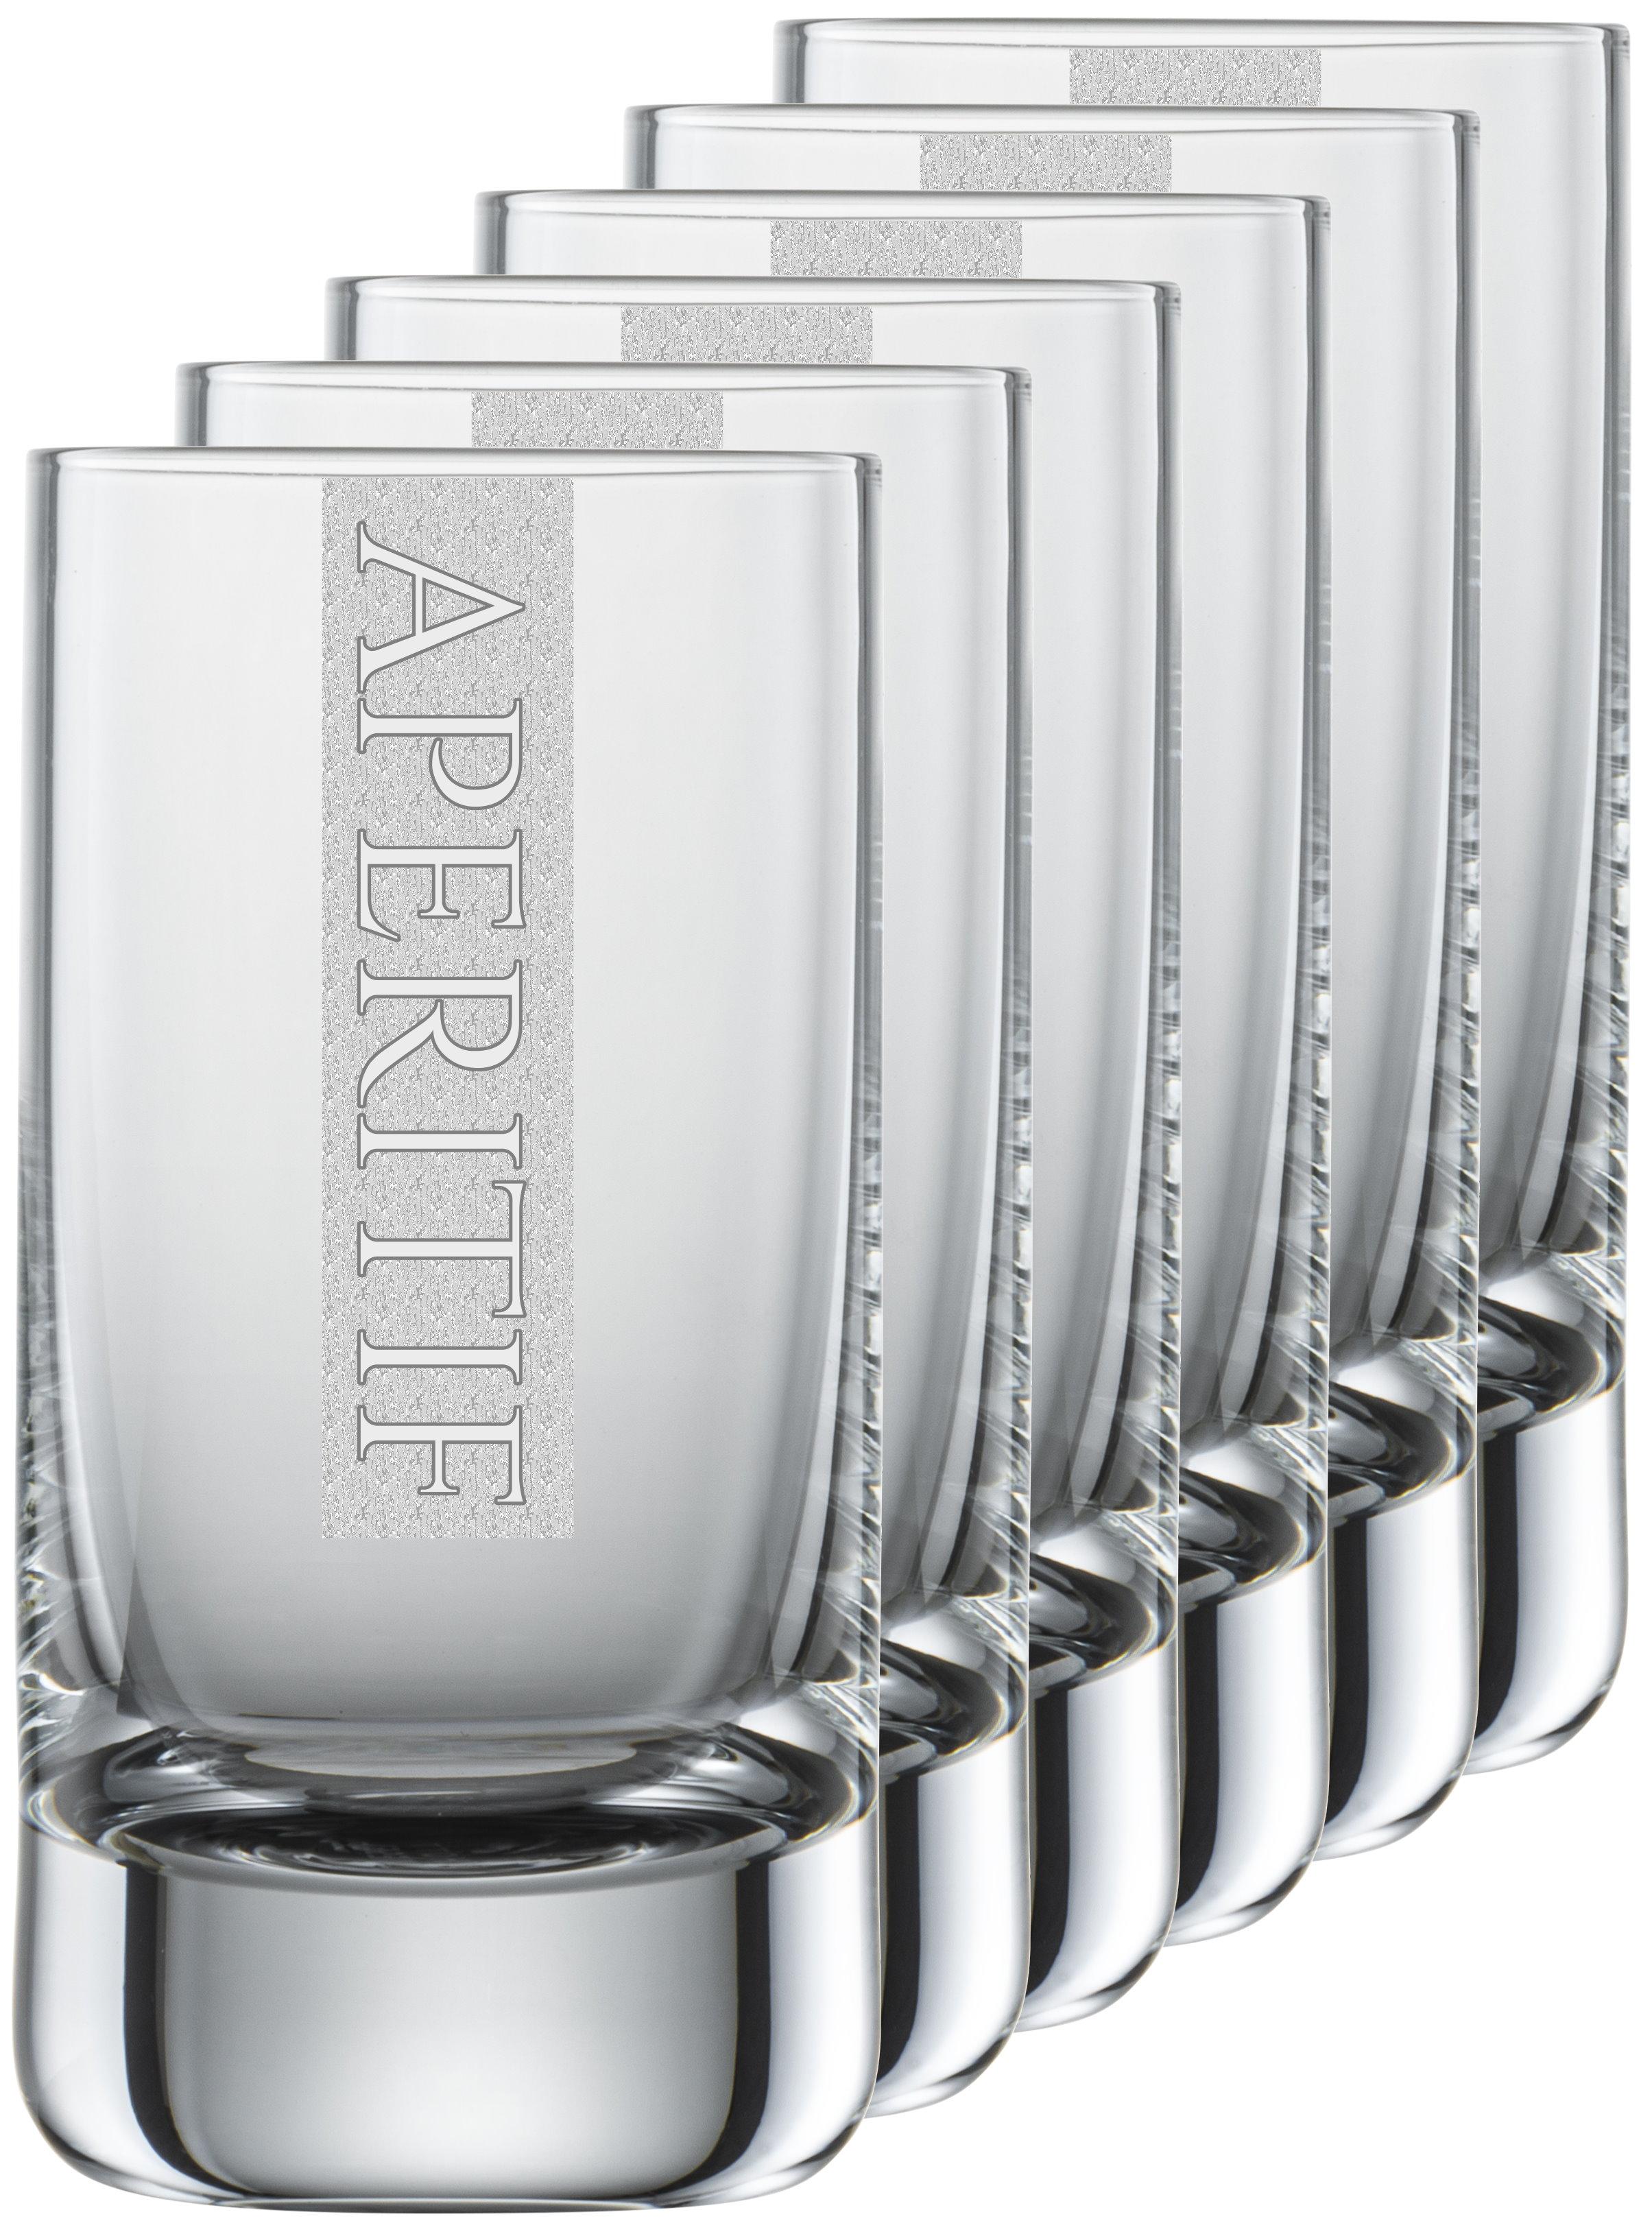 APERITIF Gläser   6 Stück 5cl Schott Schnapsglas   CoolGlas